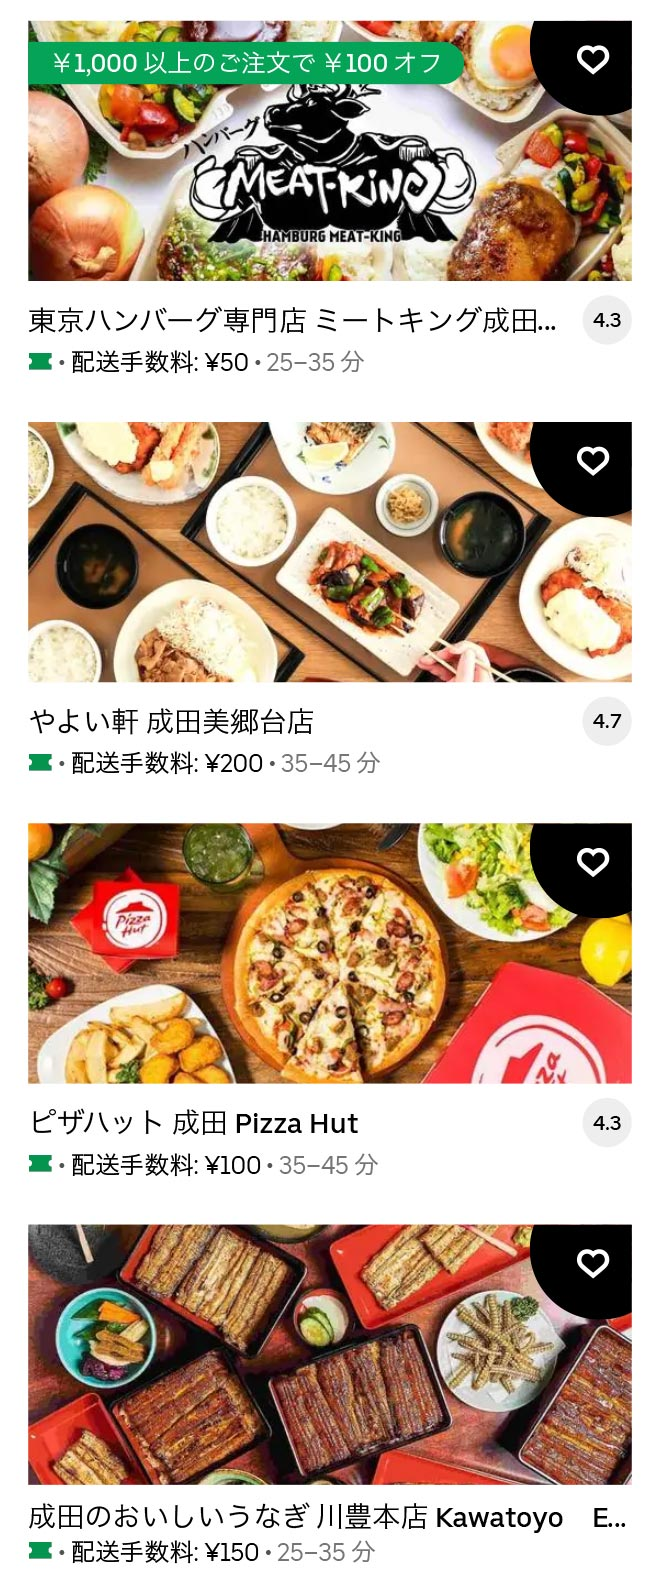 U narita menu 2104 08